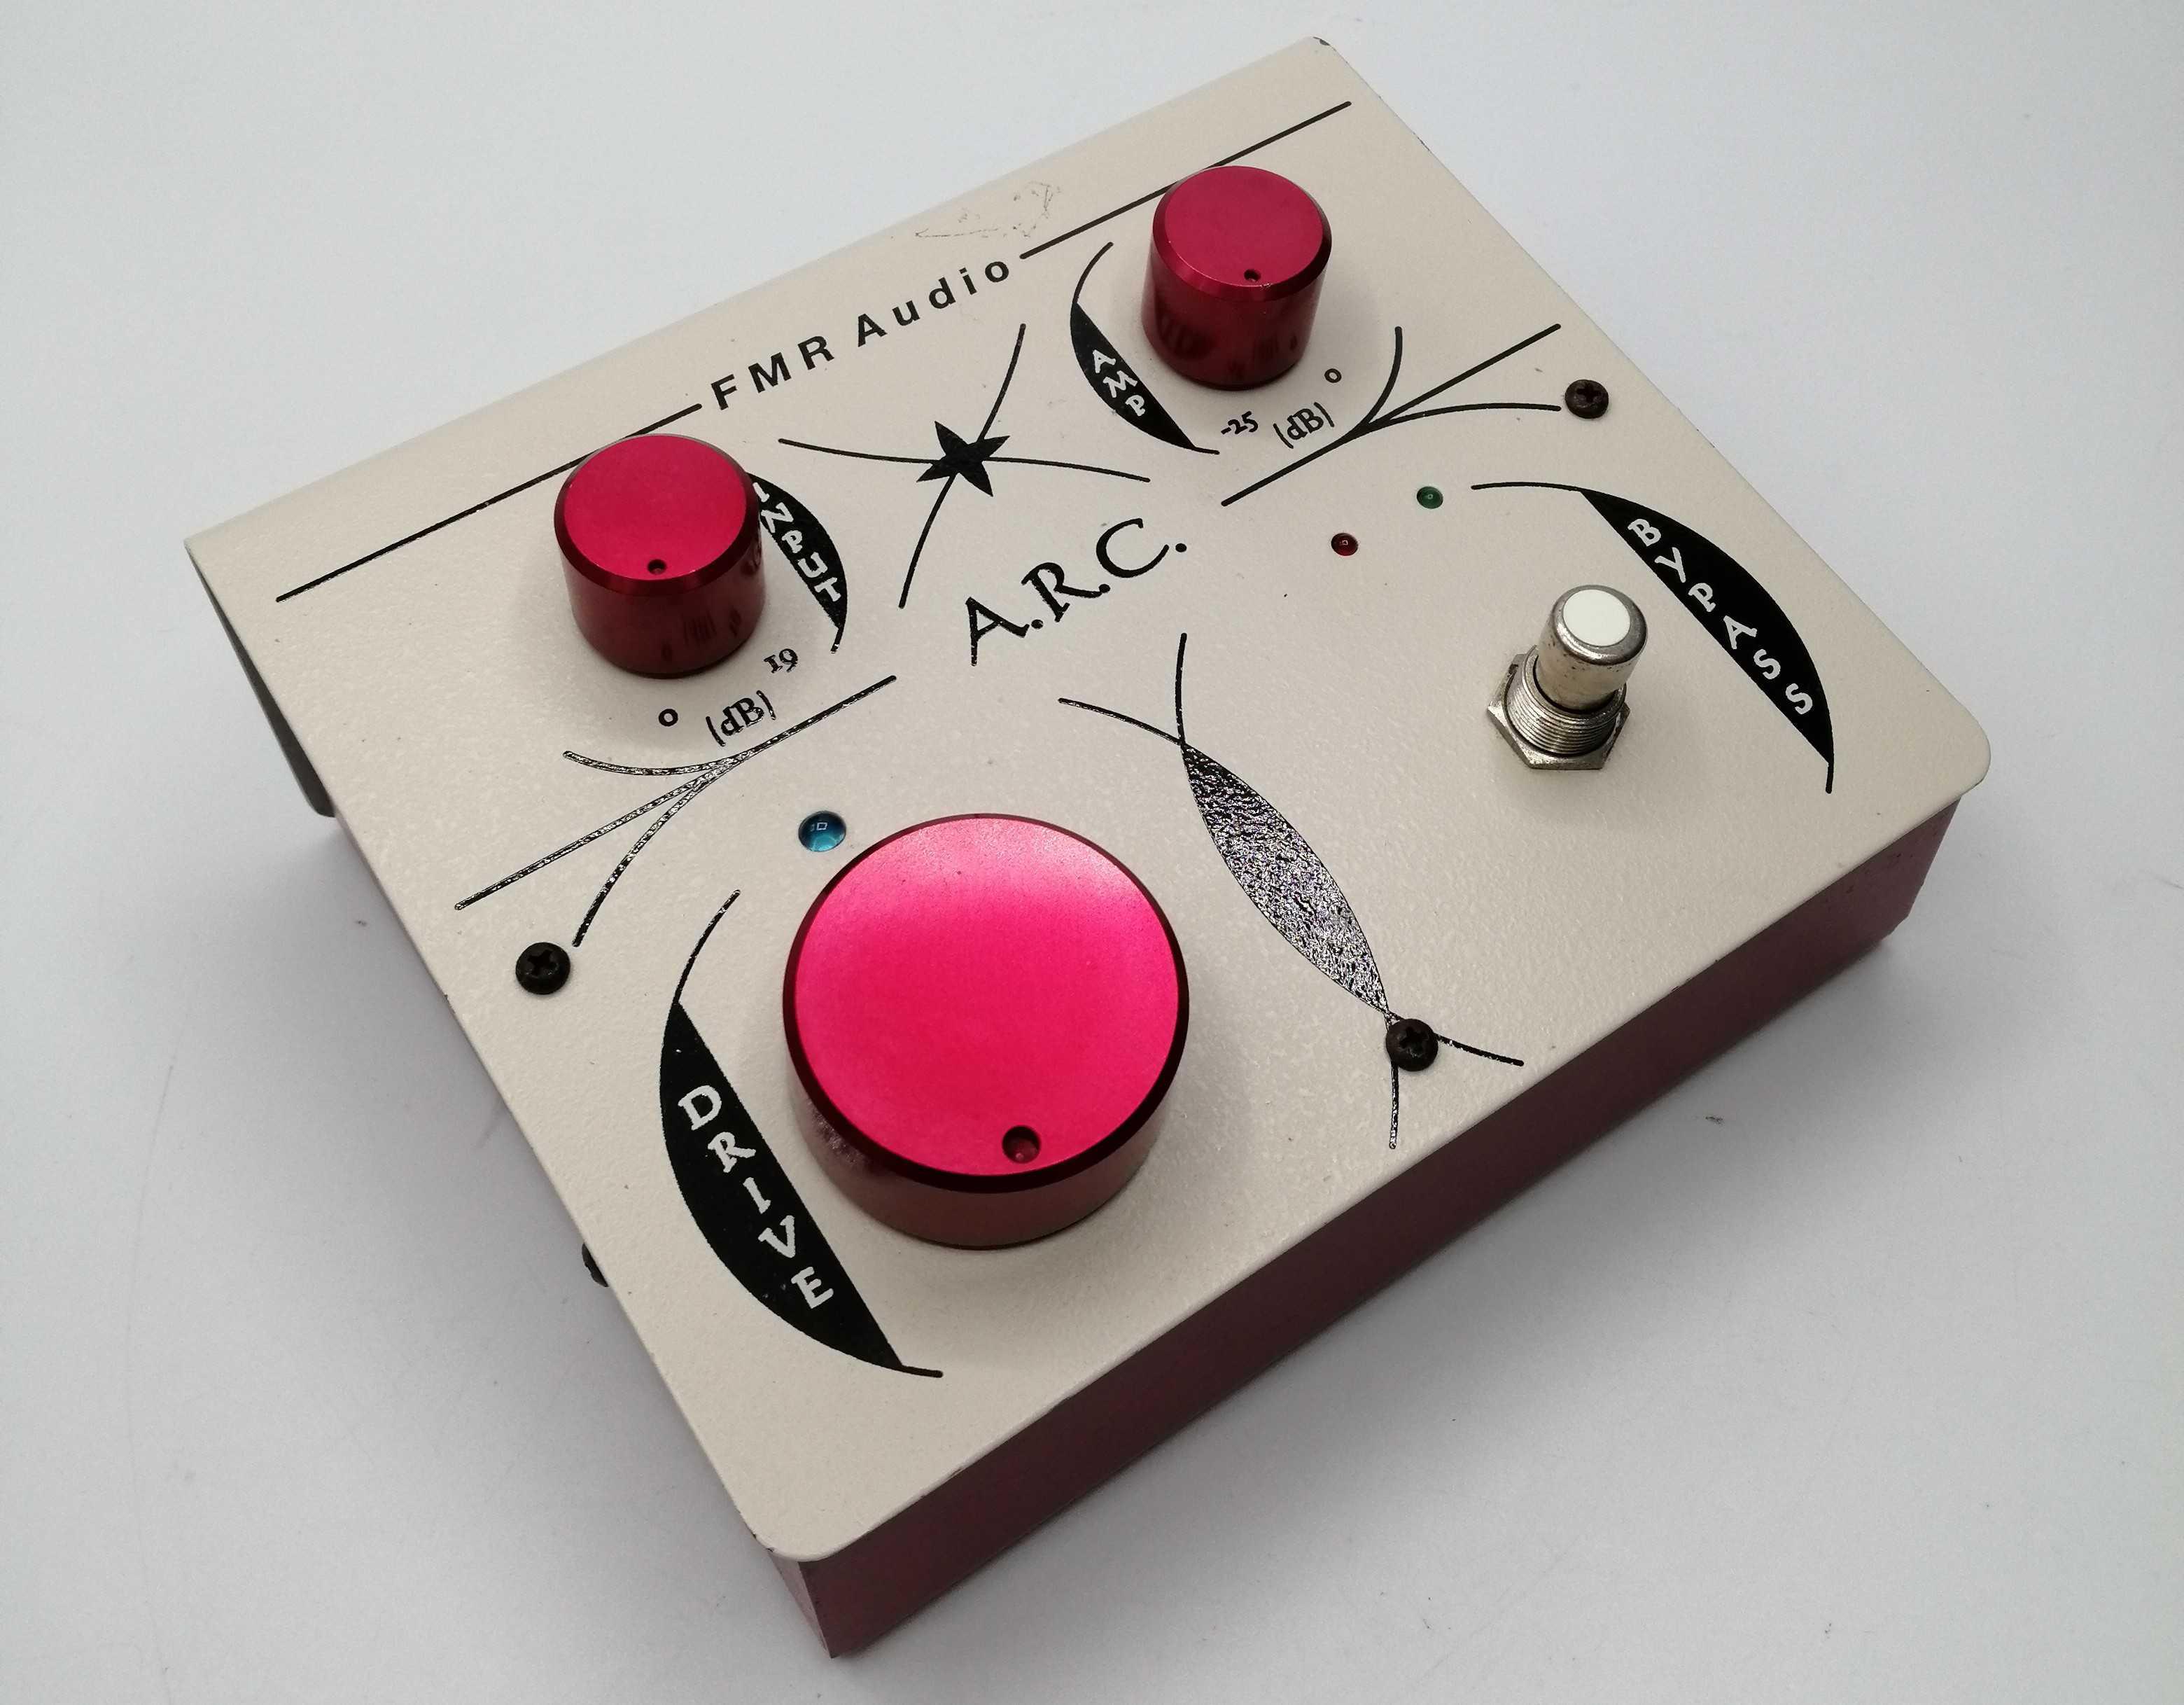 初期型 A.R.C FMR AUDIO